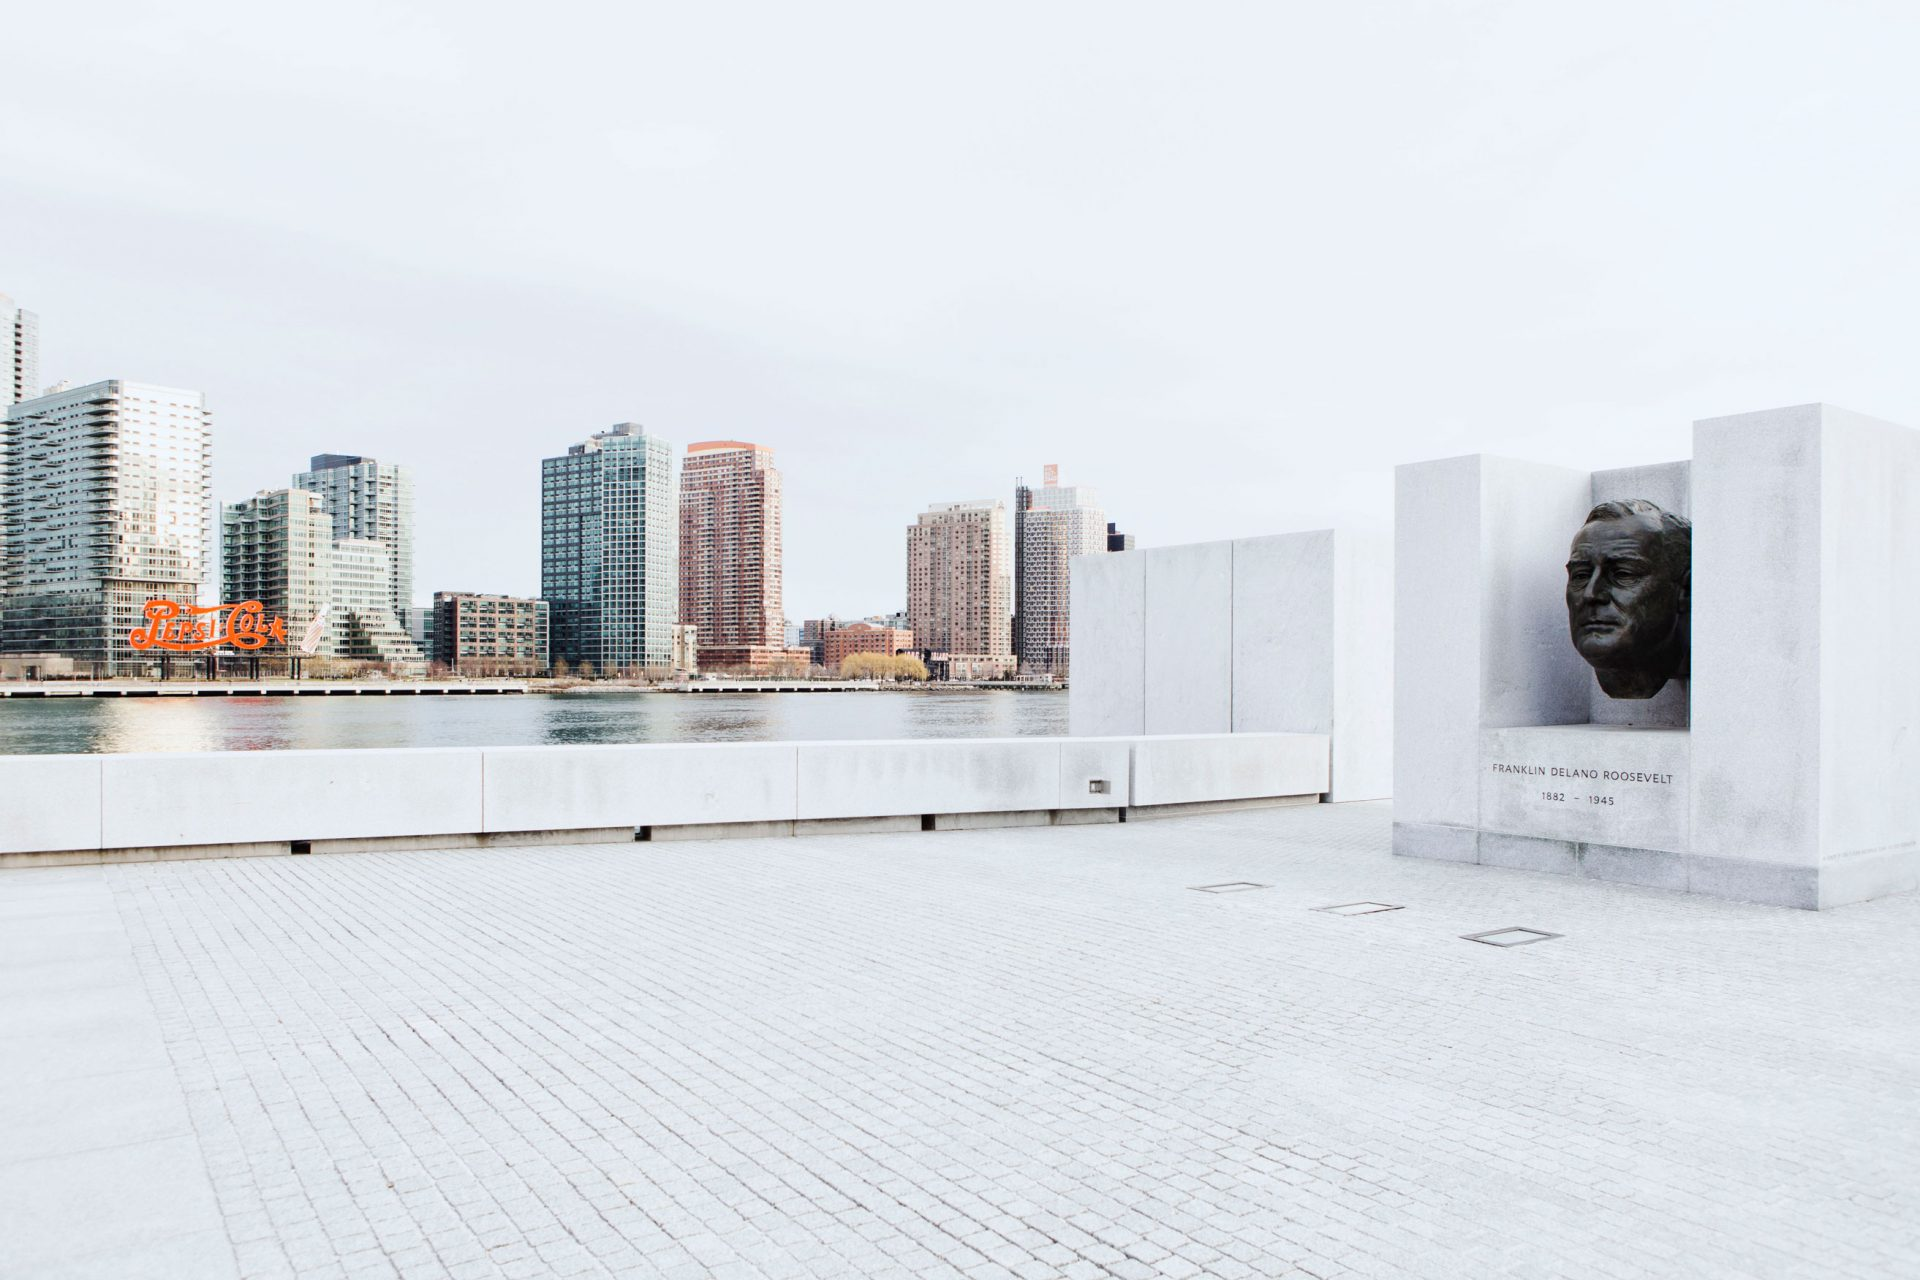 08-simonbosch-photography-simon-bosch-architectuur-architecture-bogota-colombia-New York-Louis Kahn